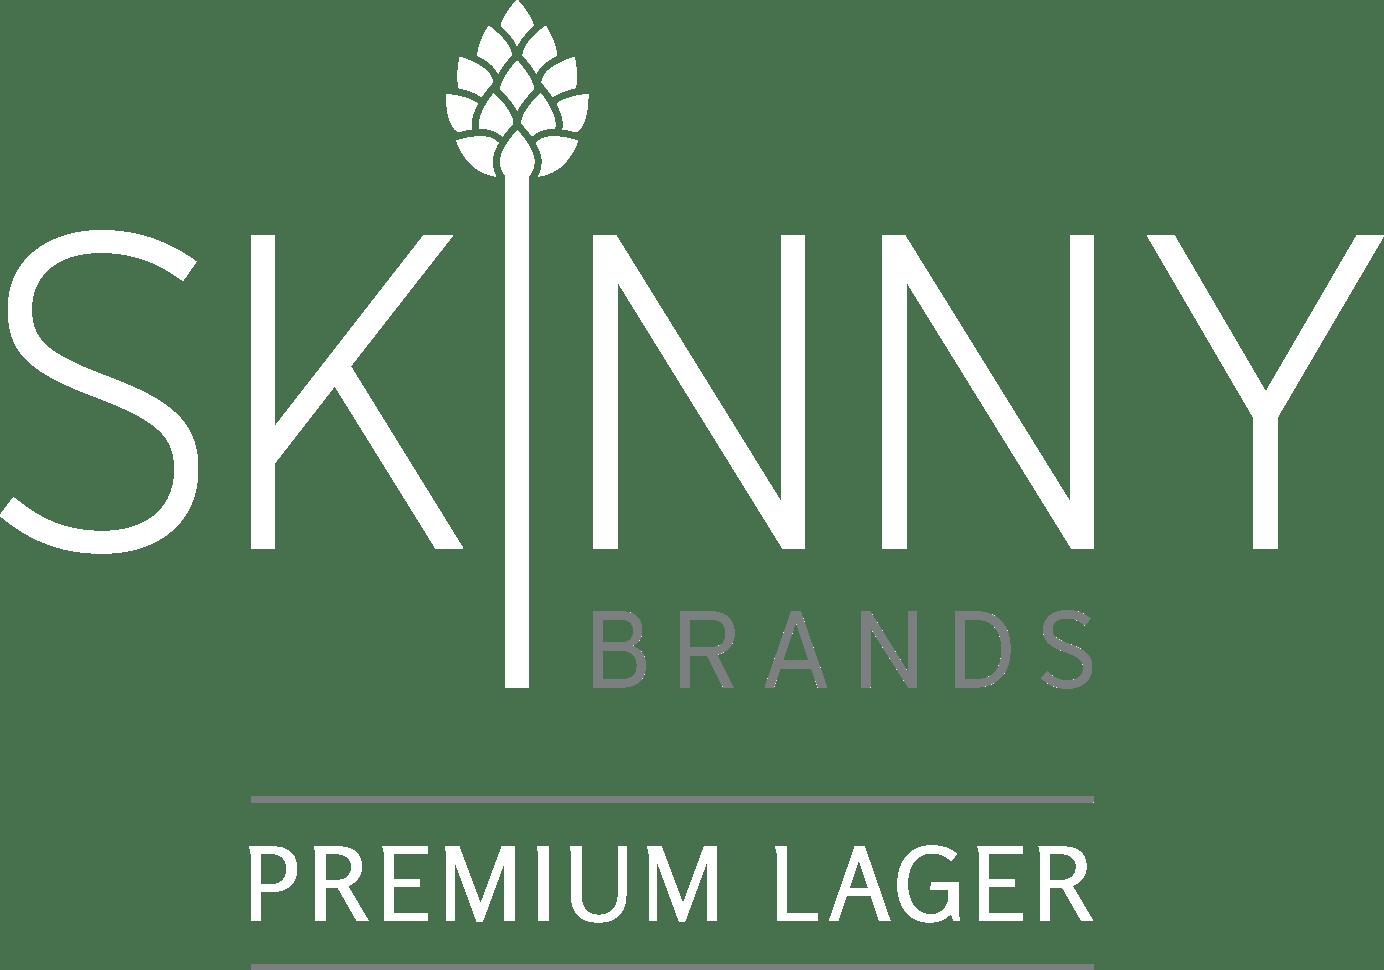 SkinnyBrands-Logo-2019_Premium_Lager